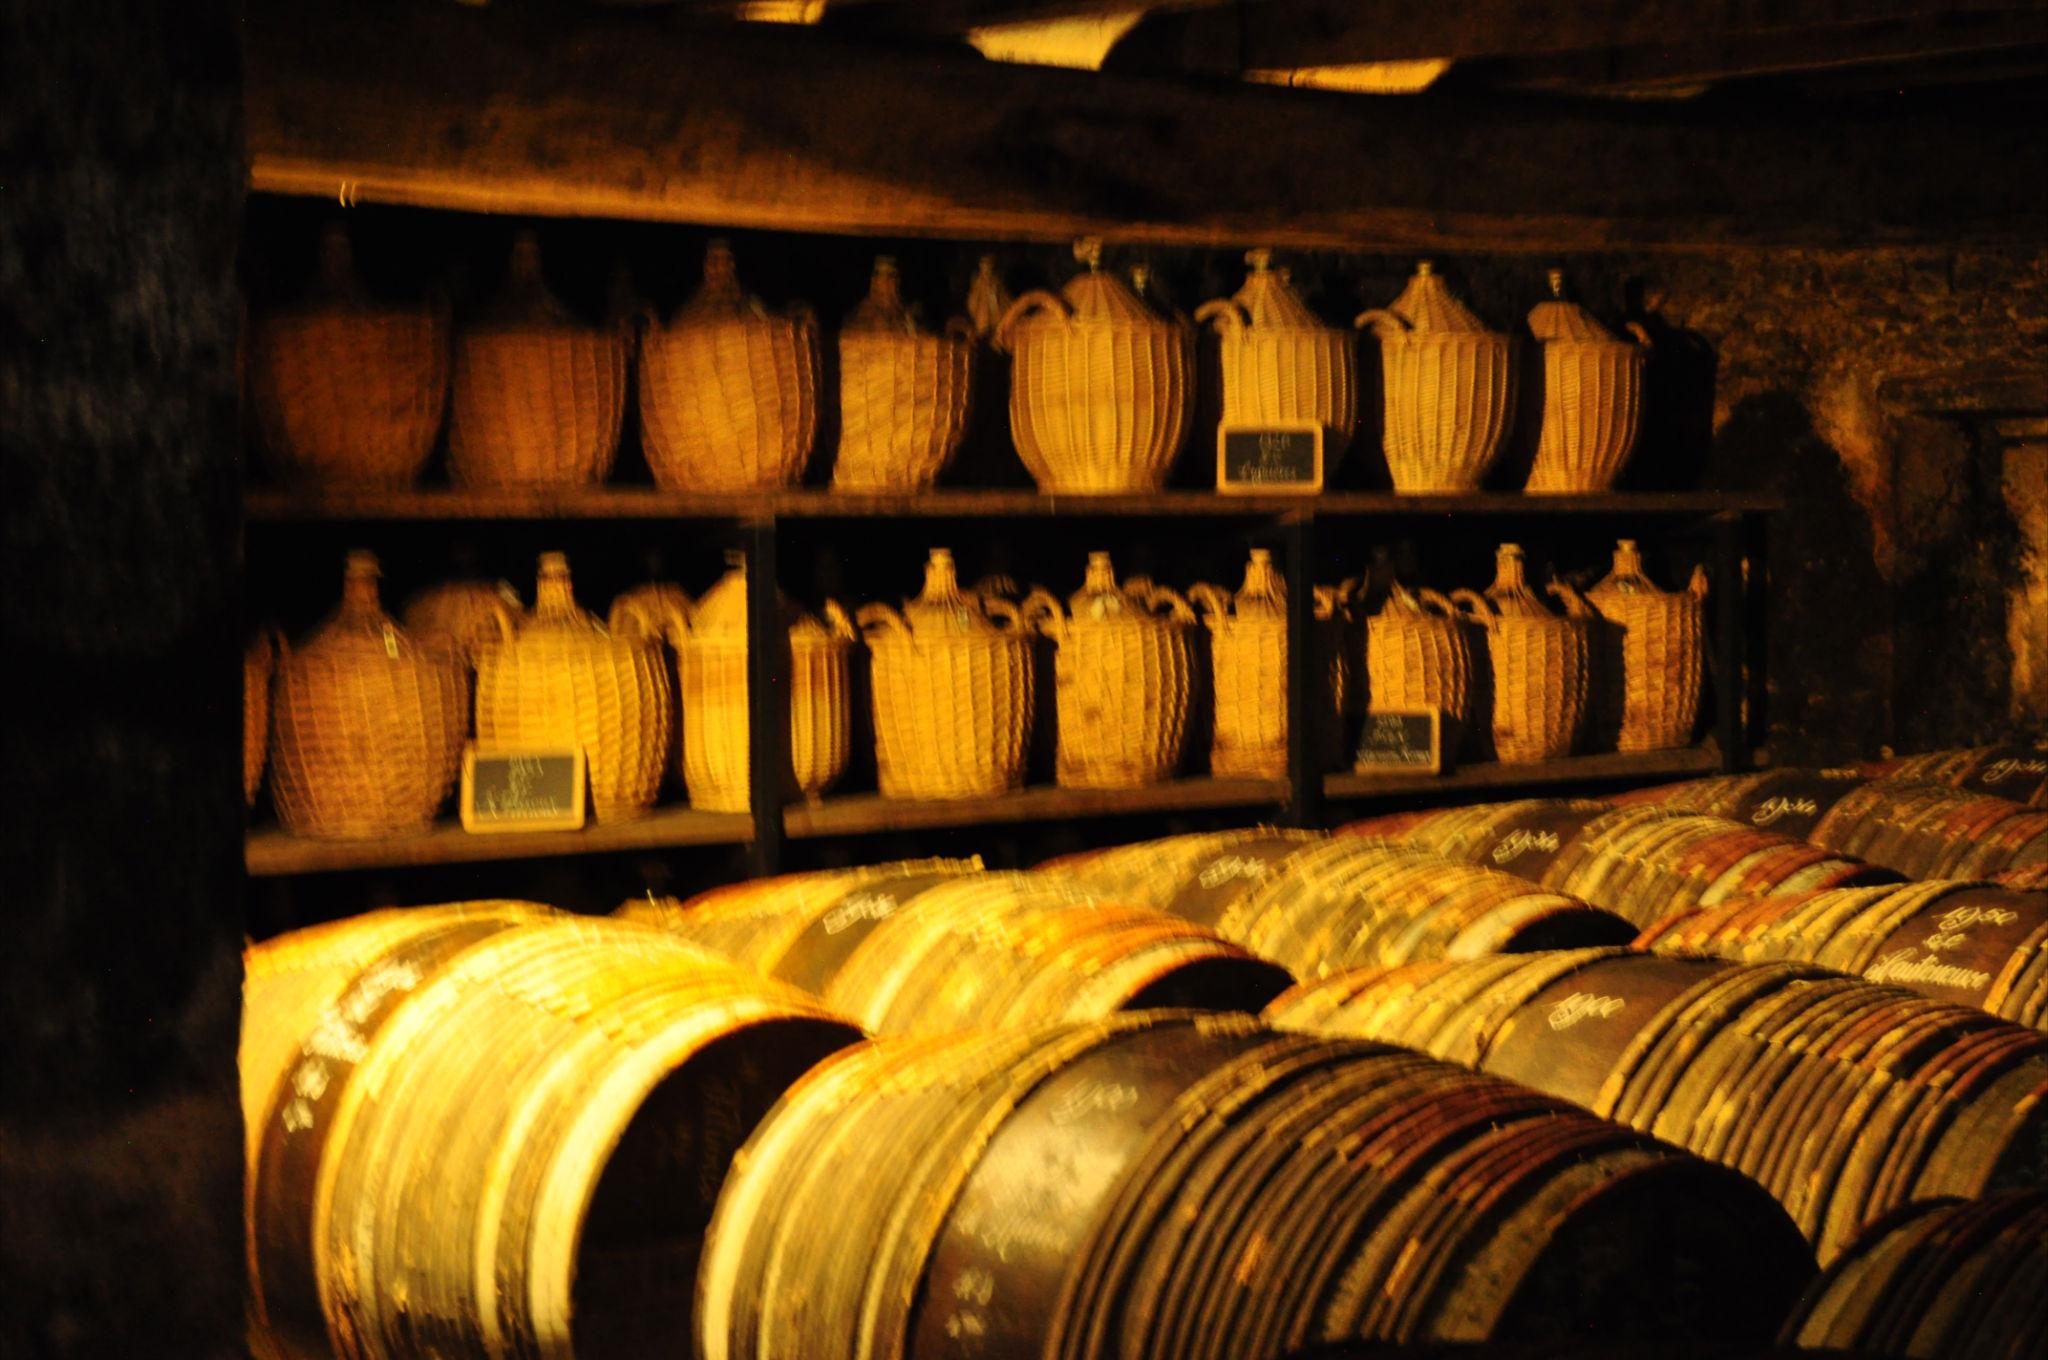 Hennessy cellar & paradis